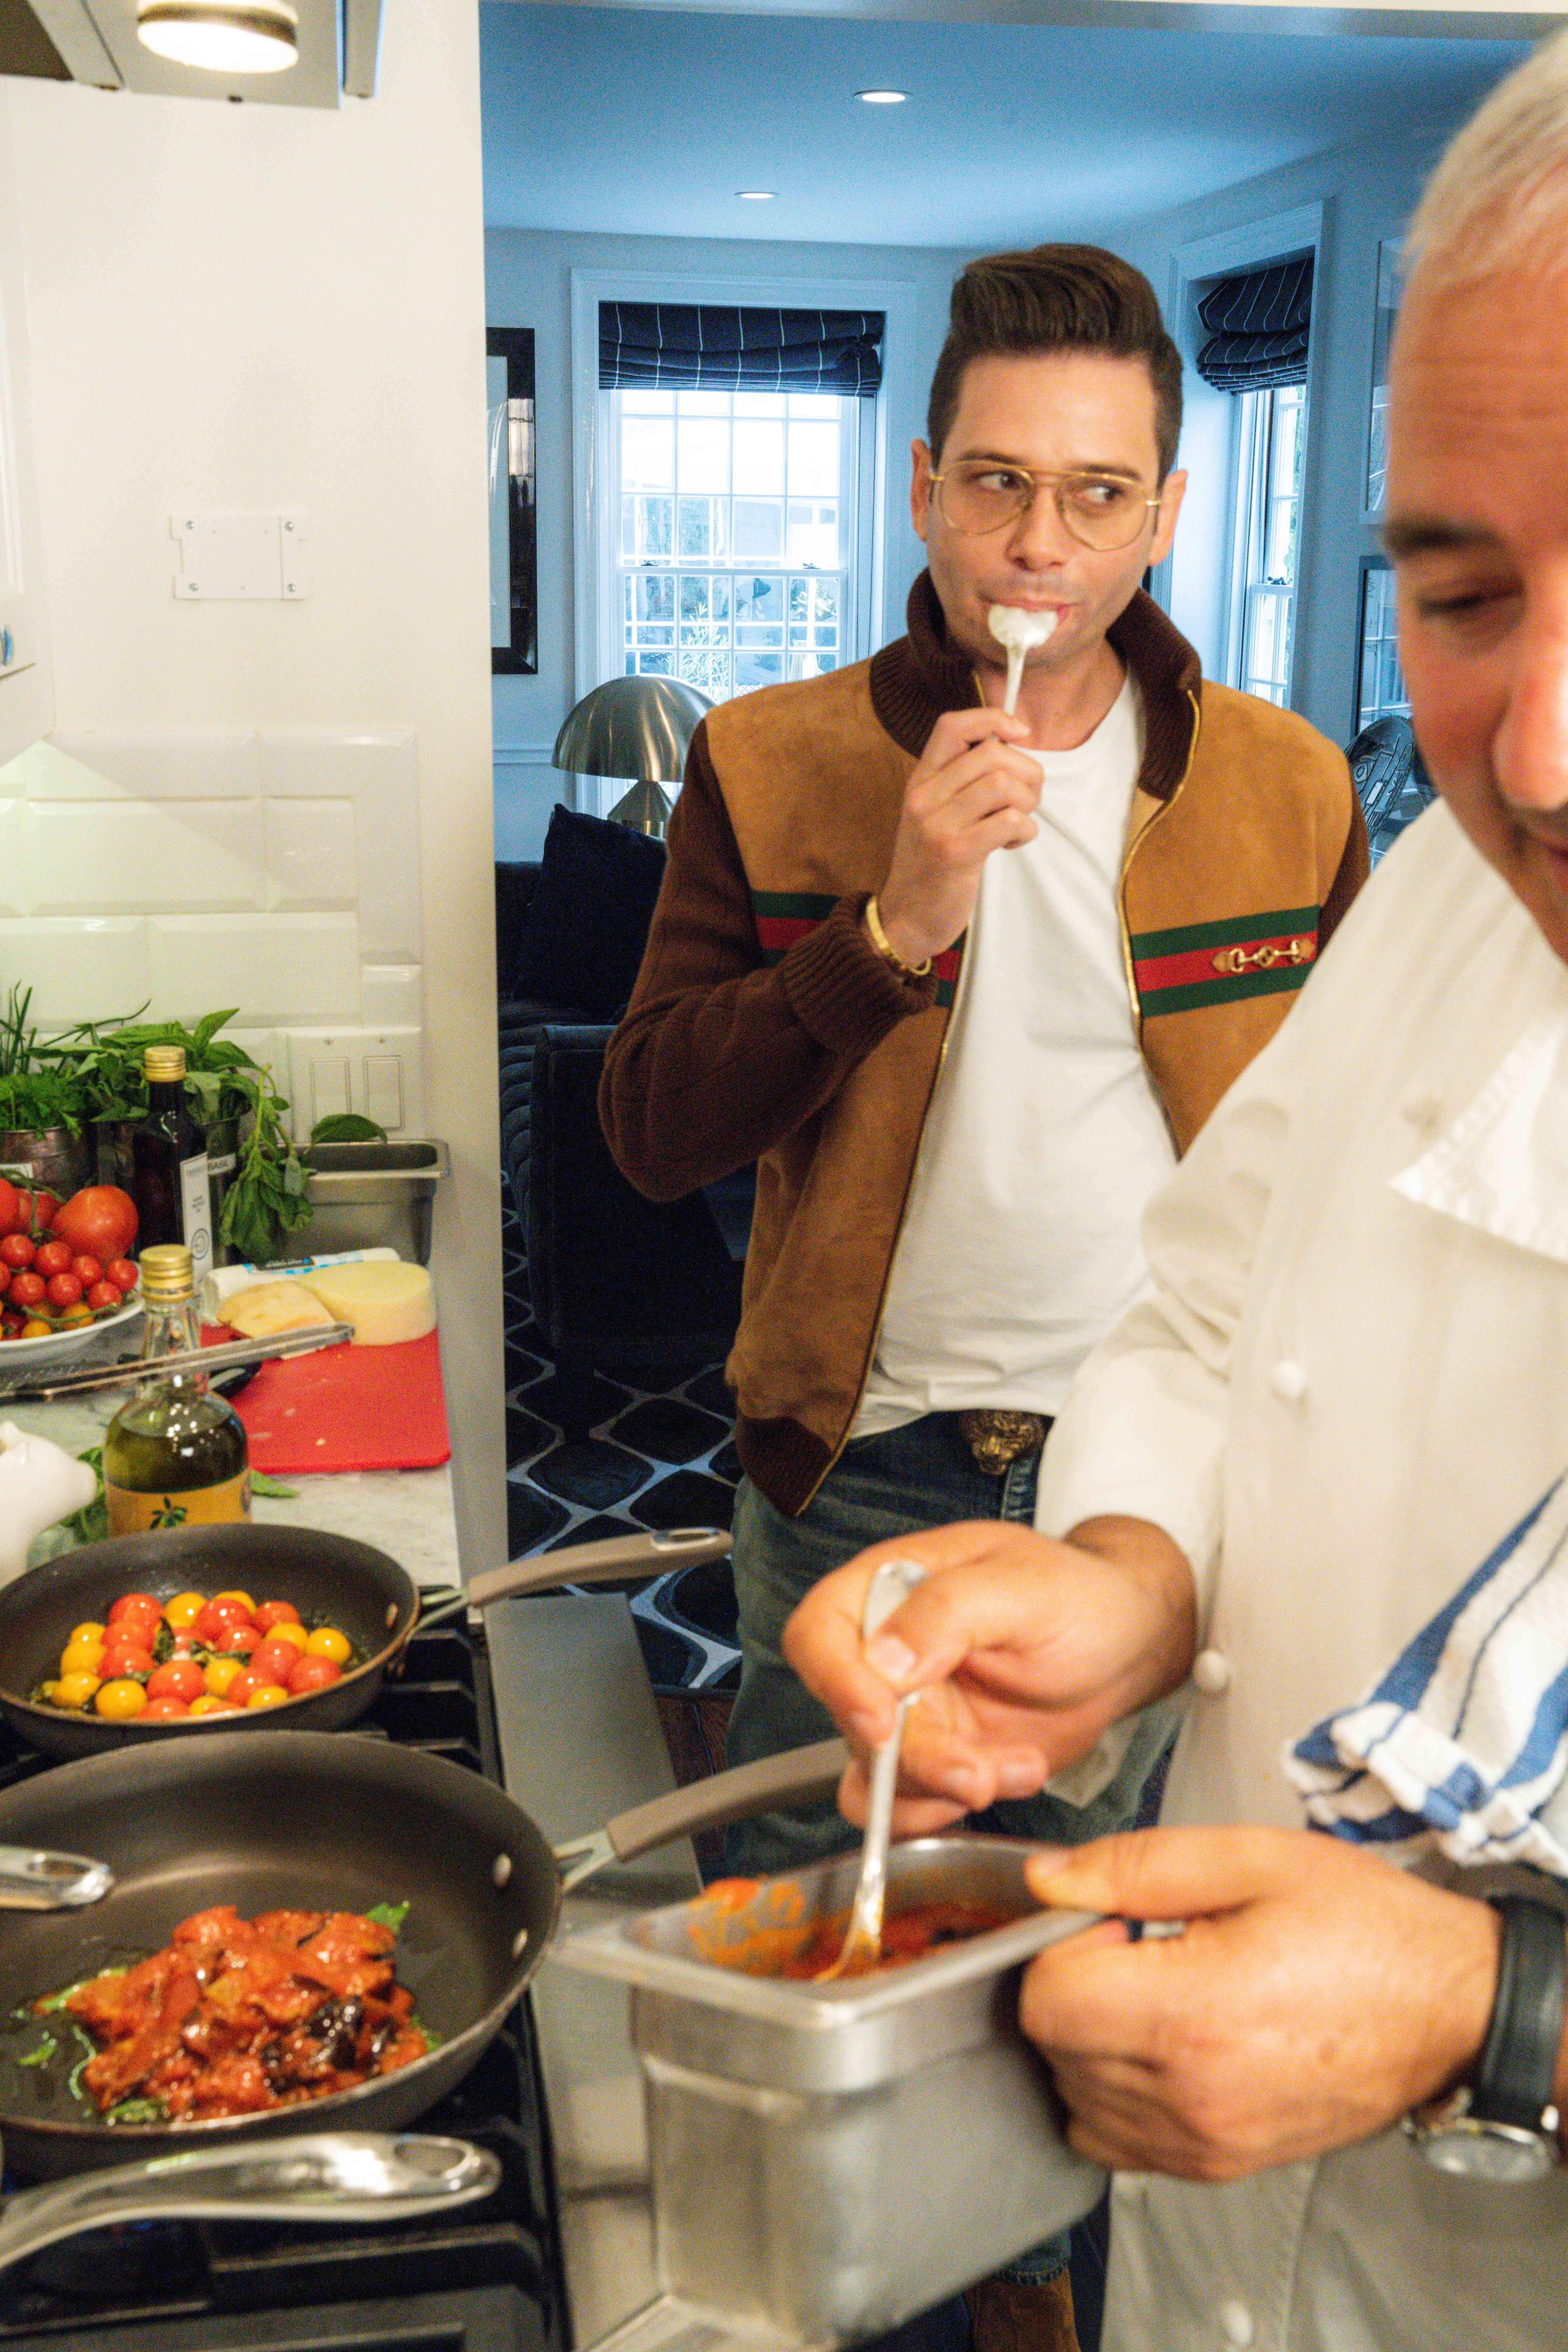 Josh Flagg and Chef Giacomino Drago in kitchen